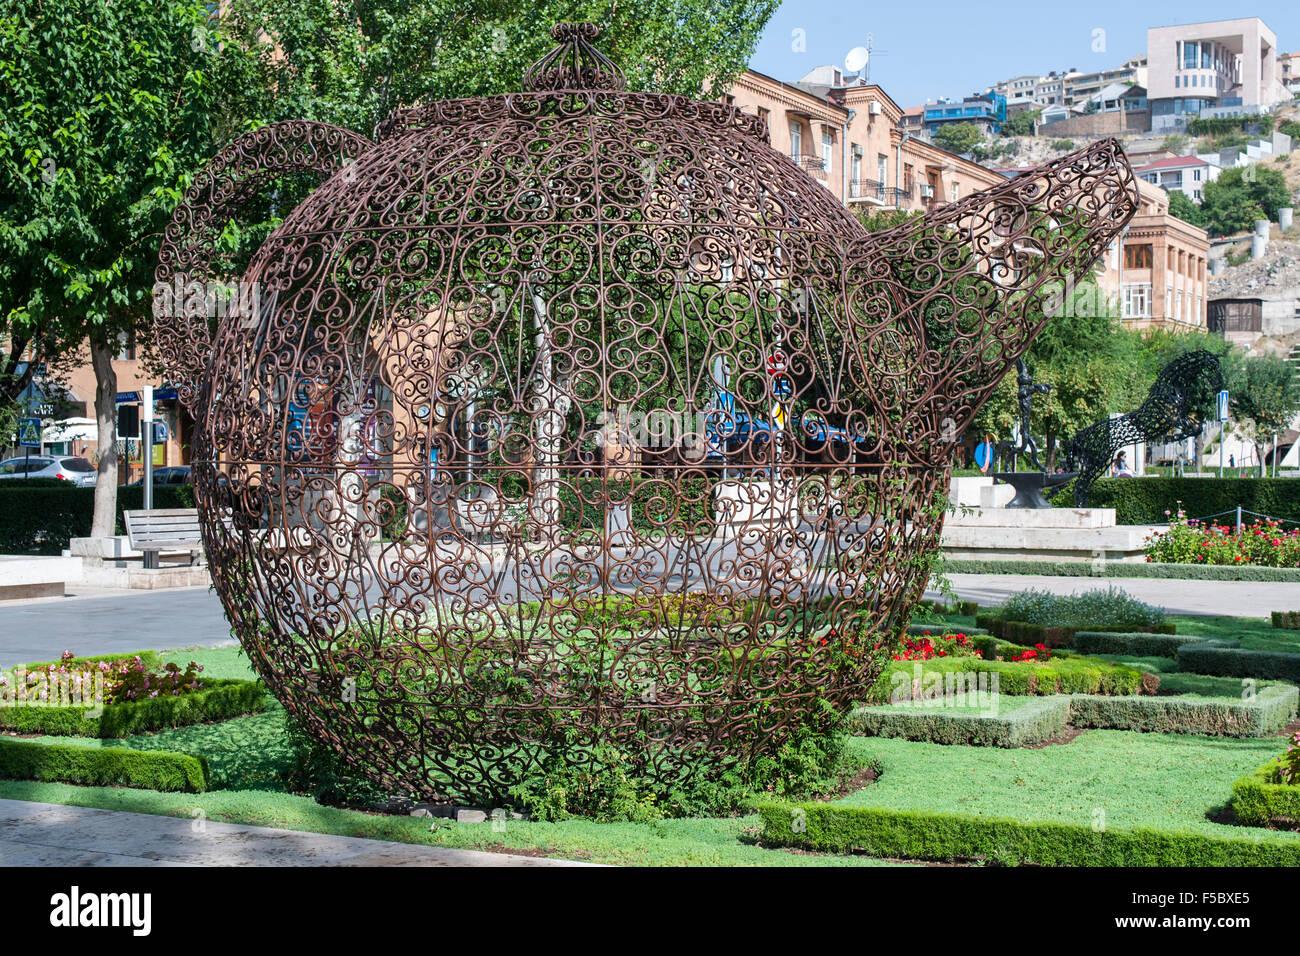 Tea pot art piece by Joana Vasconcelos in Yerevan, the capital of Armenia. - Stock Image